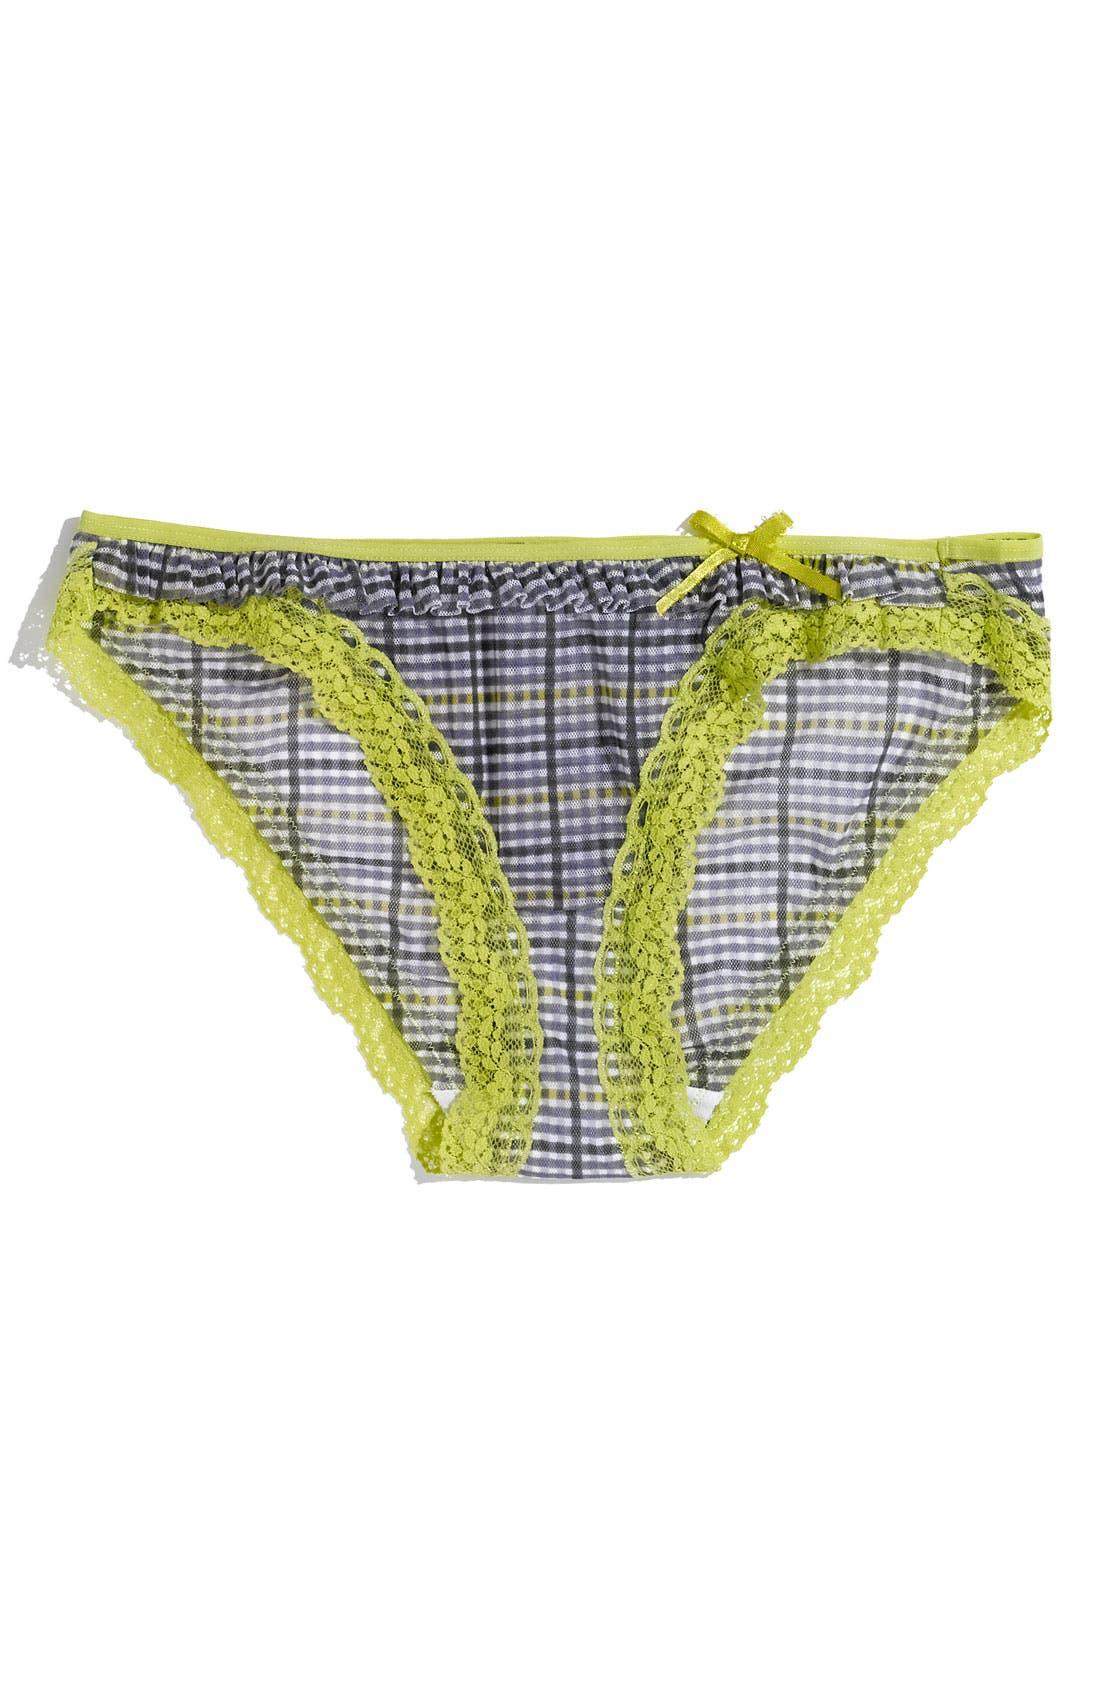 Main Image - DKNY 'Fancy Frills' Bikini